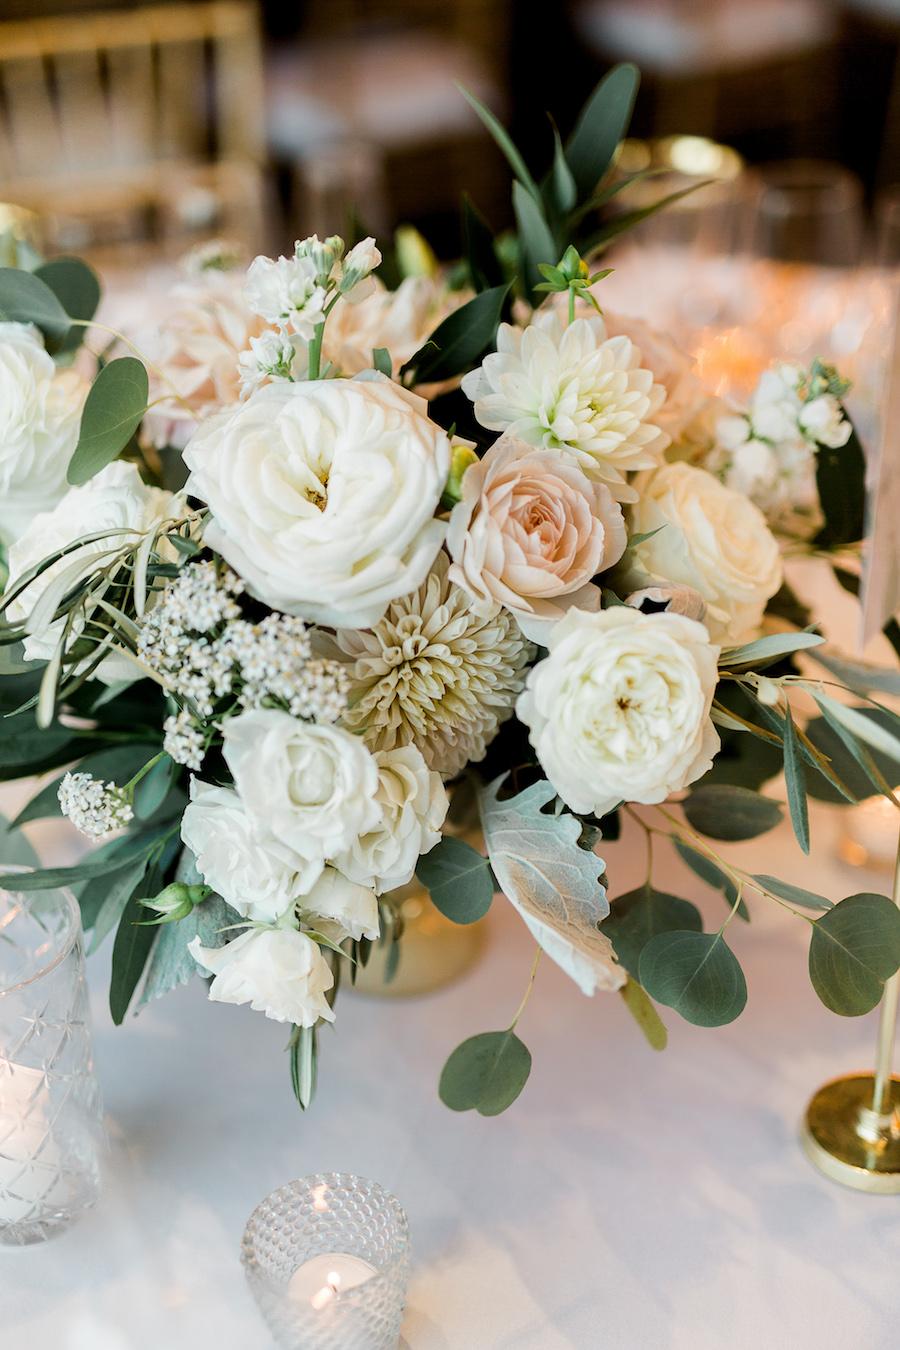 Amanda-Alex-Rustic-Chic-Wedding-Roque Events (9).jpg